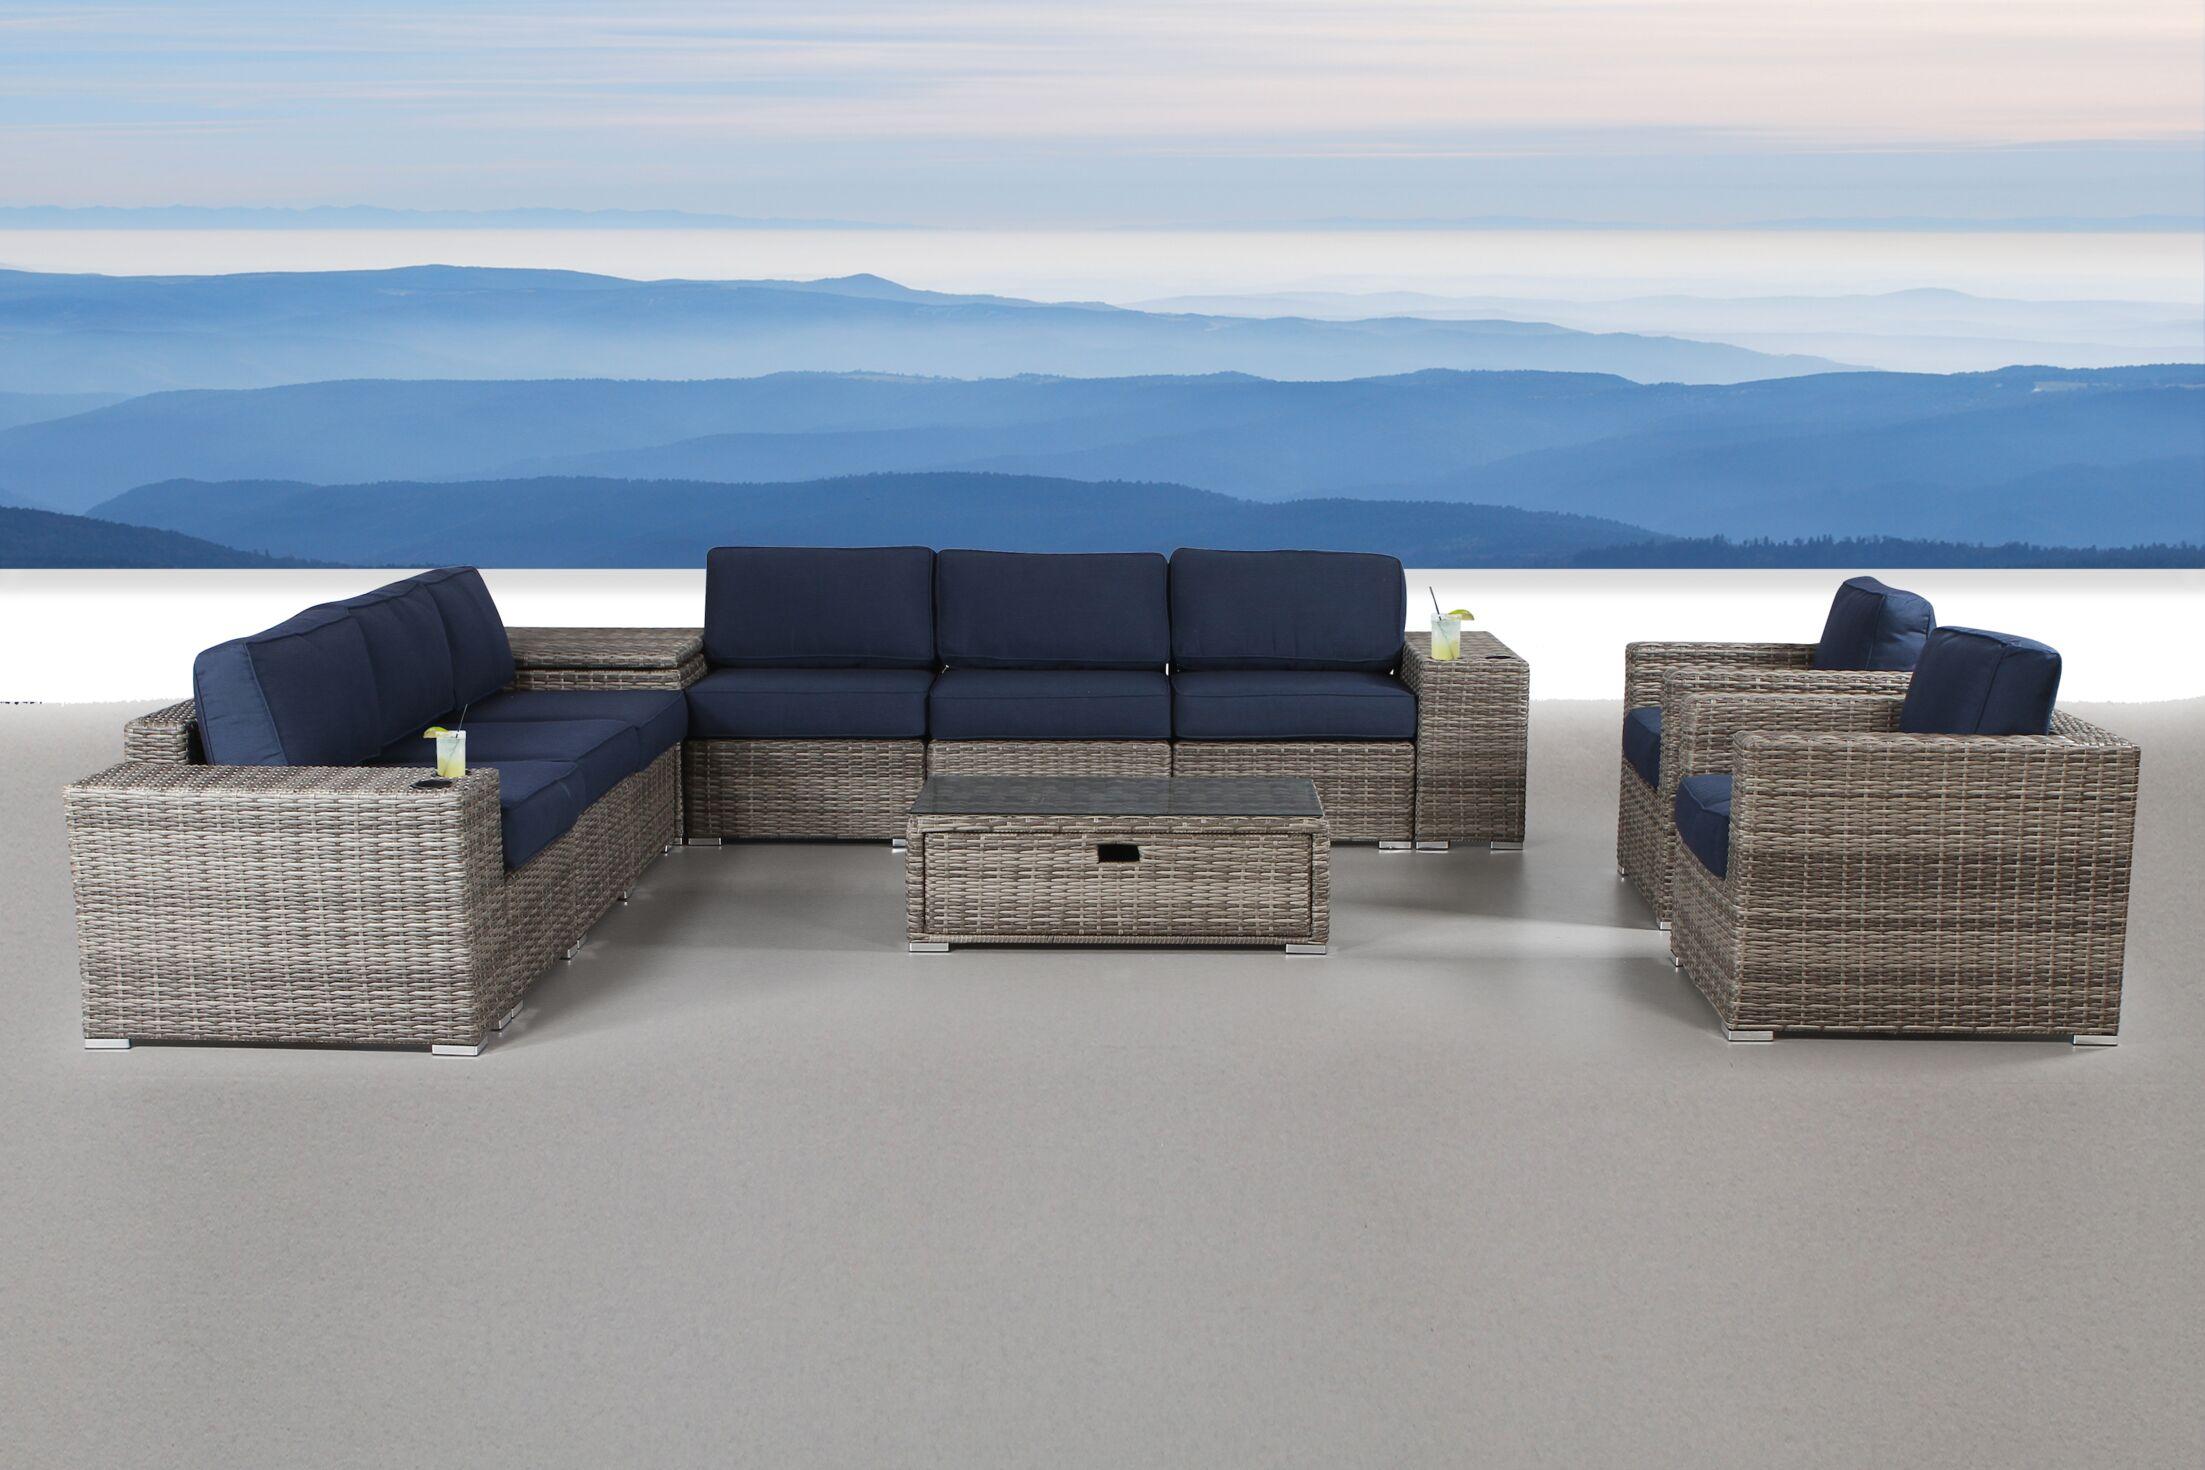 Quincy 12 Piece Rattan Sunbrella Conversation Set with Cushions